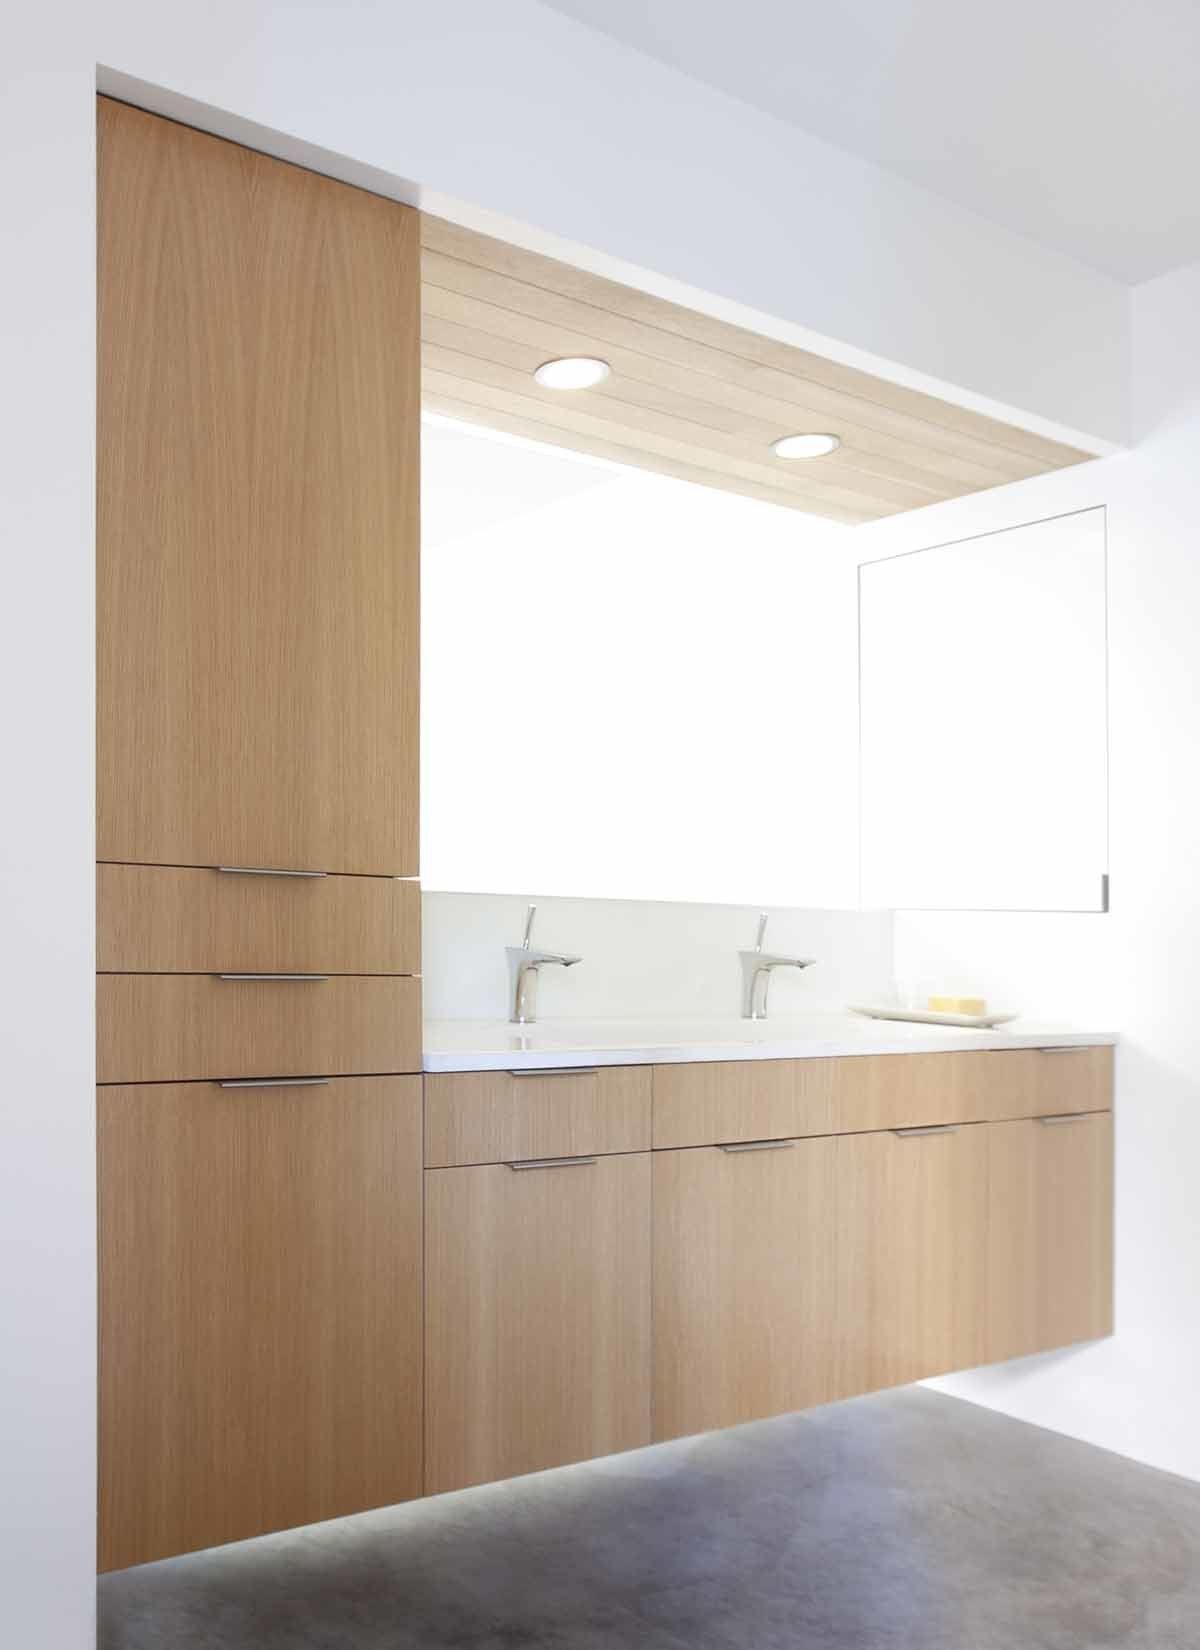 Ks Mission By Sarah Akkoush With Images Bathroom Design Best